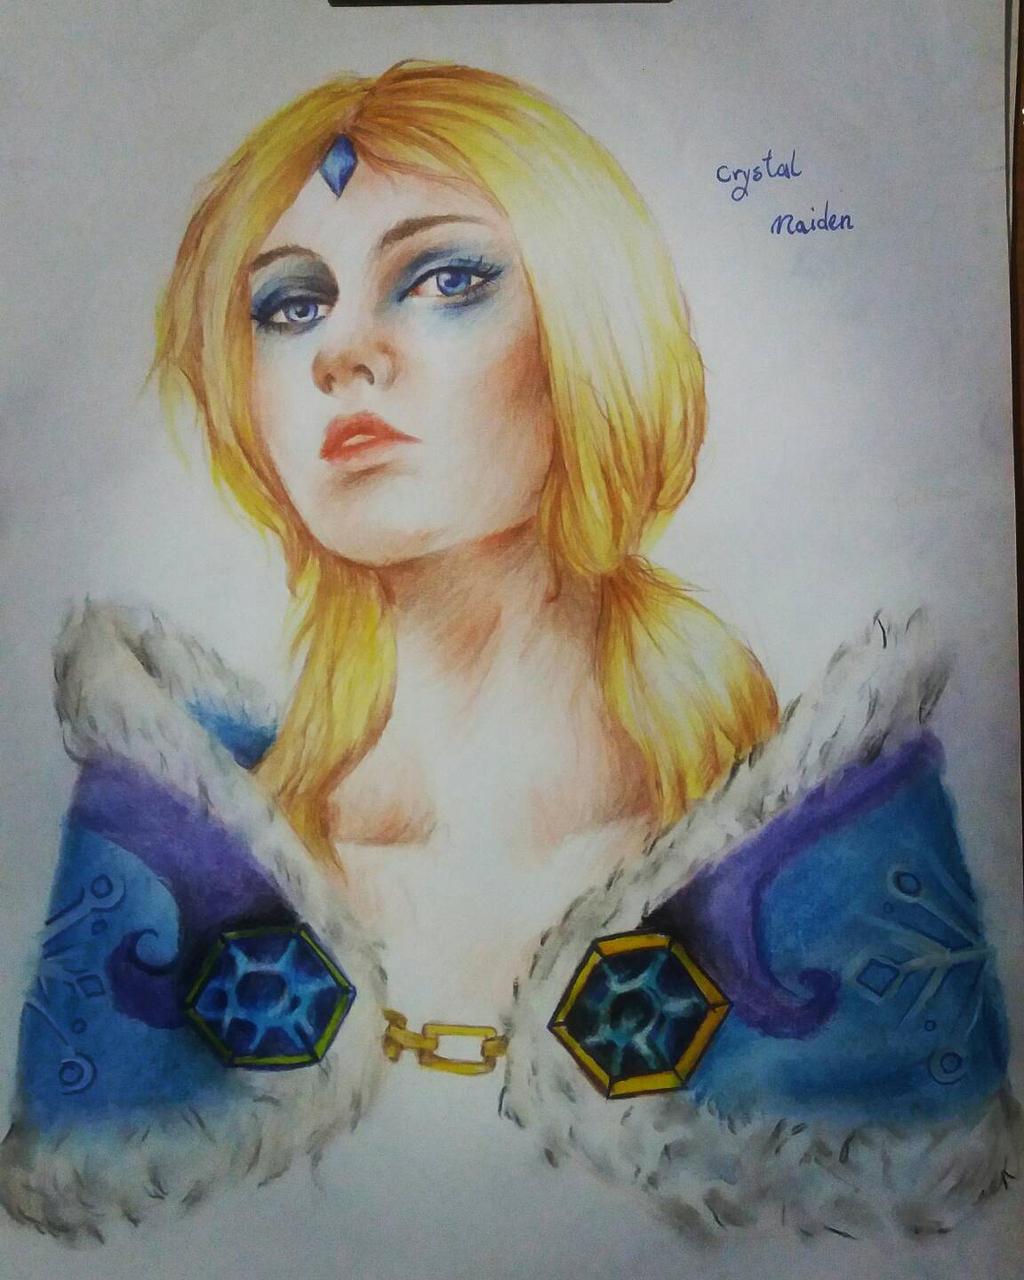 dota 2 crystal maiden by mahla shatter on deviantart